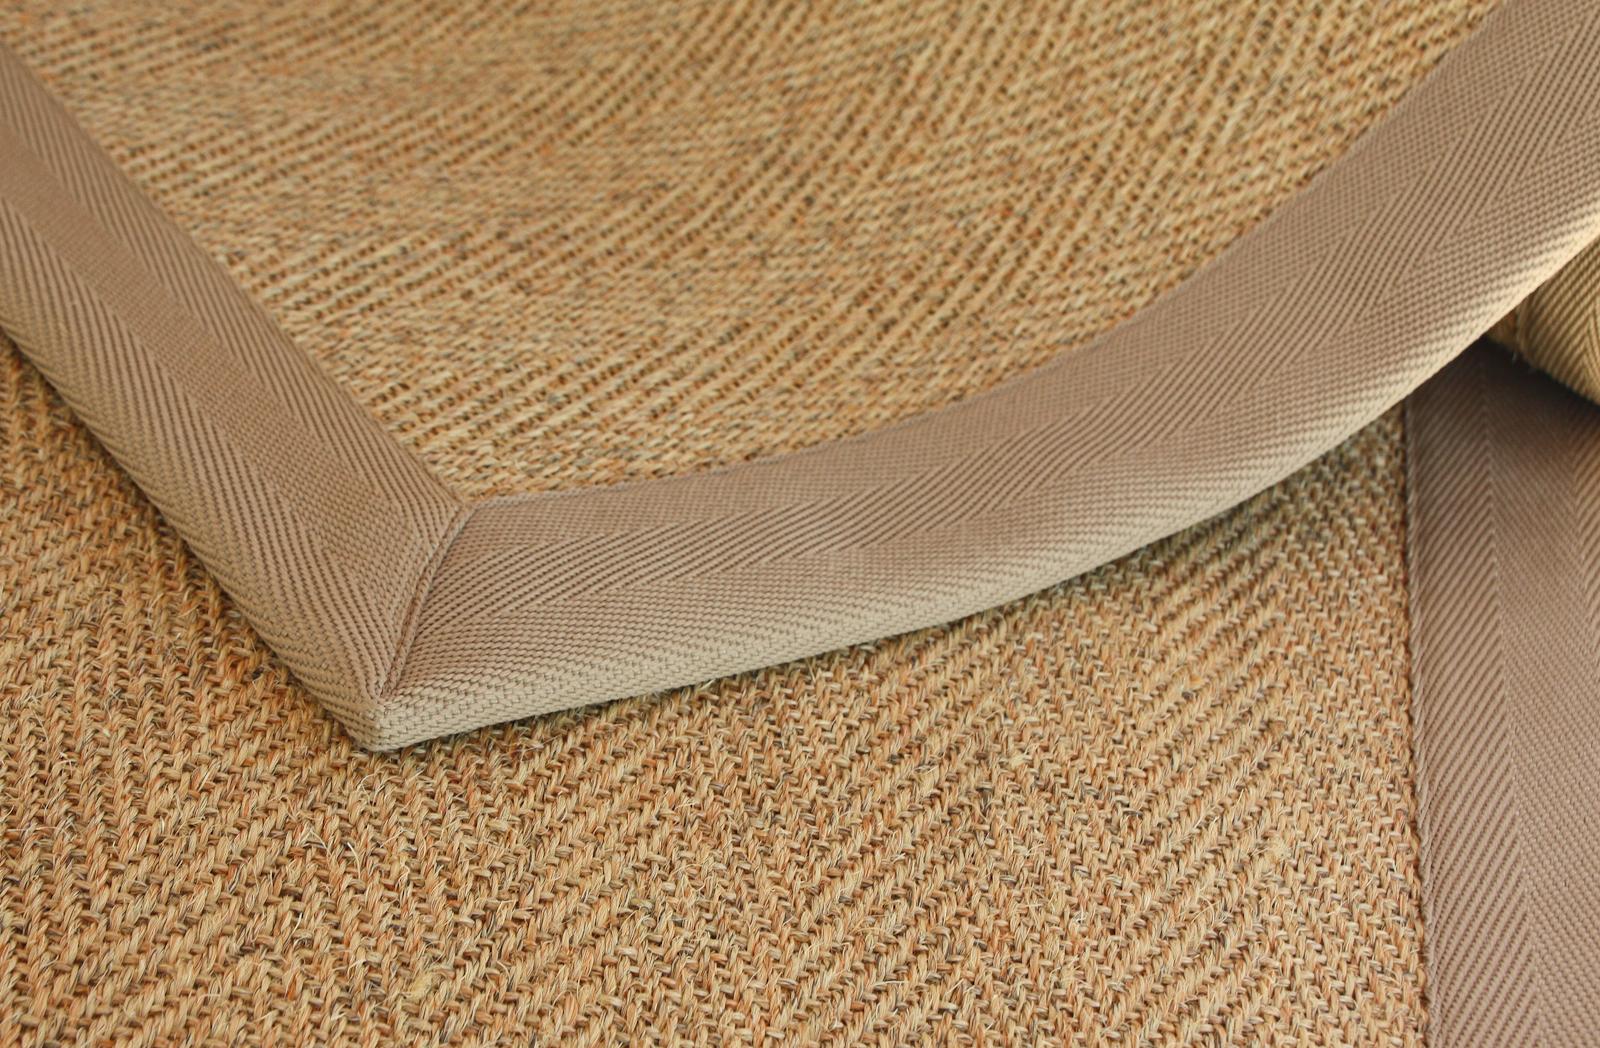 Mundoalfombra alfombras baratas por internet modernas - Alfombra sisal ...